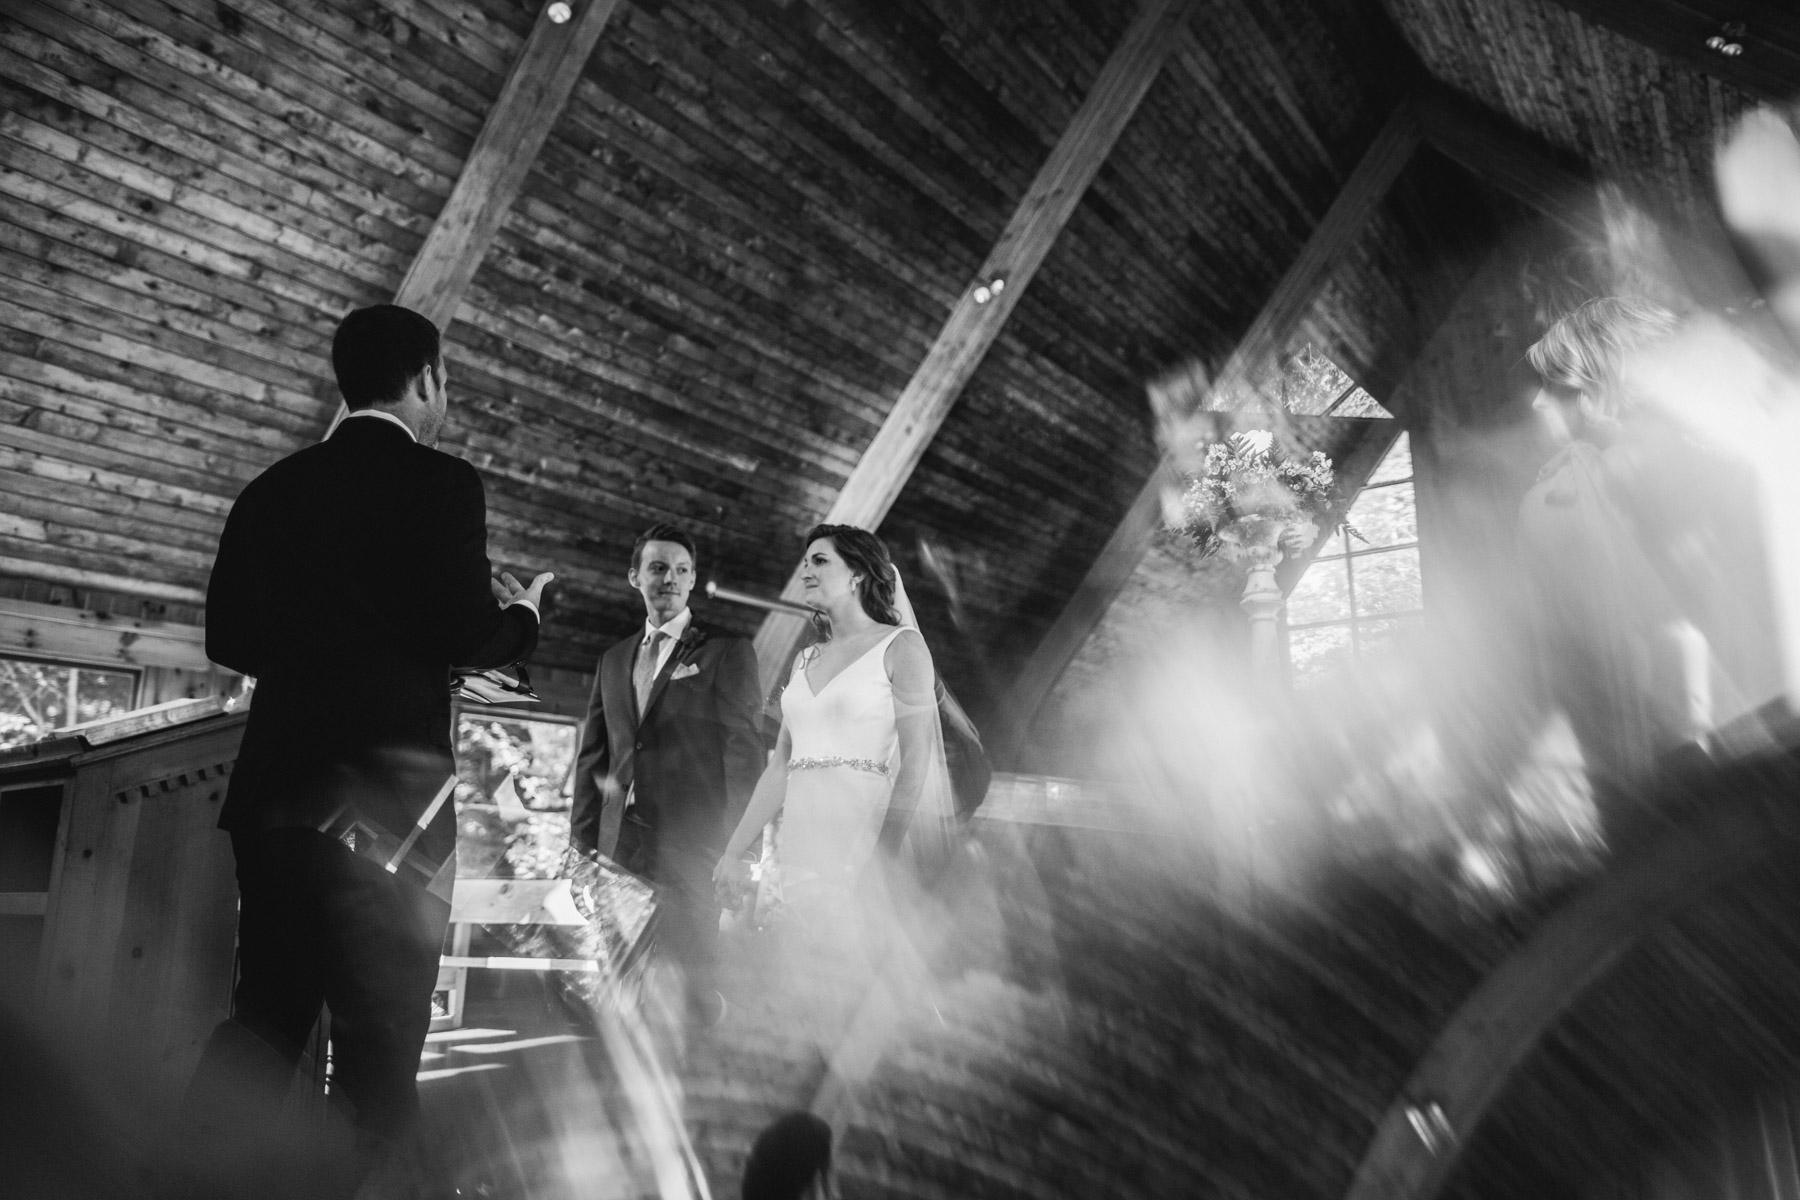 Wedding-Photography-Campground-8.jpg